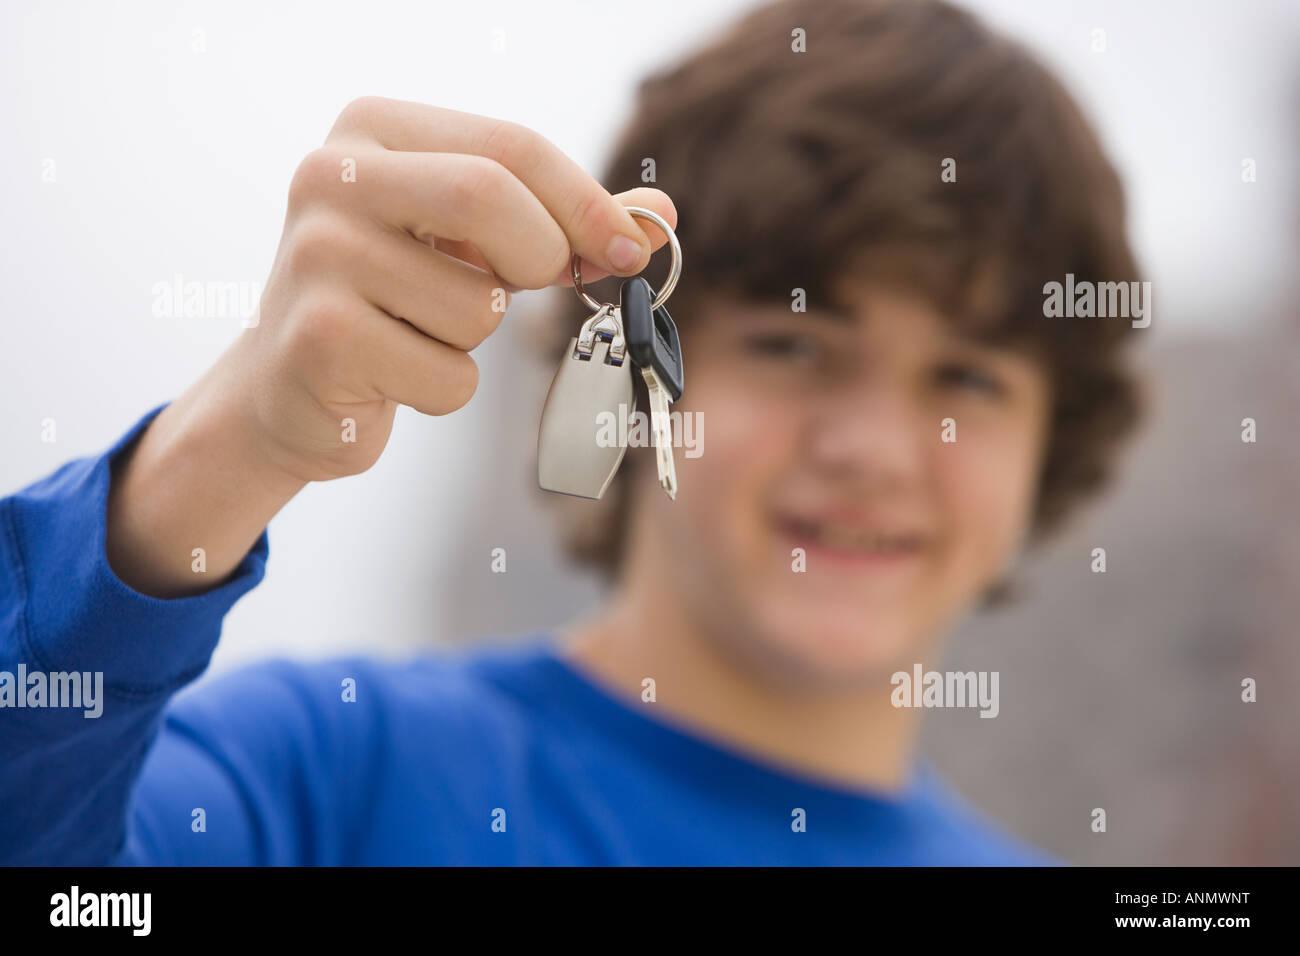 15 Schlüssel Stockfotos & 15 Schlüssel Bilder - Alamy